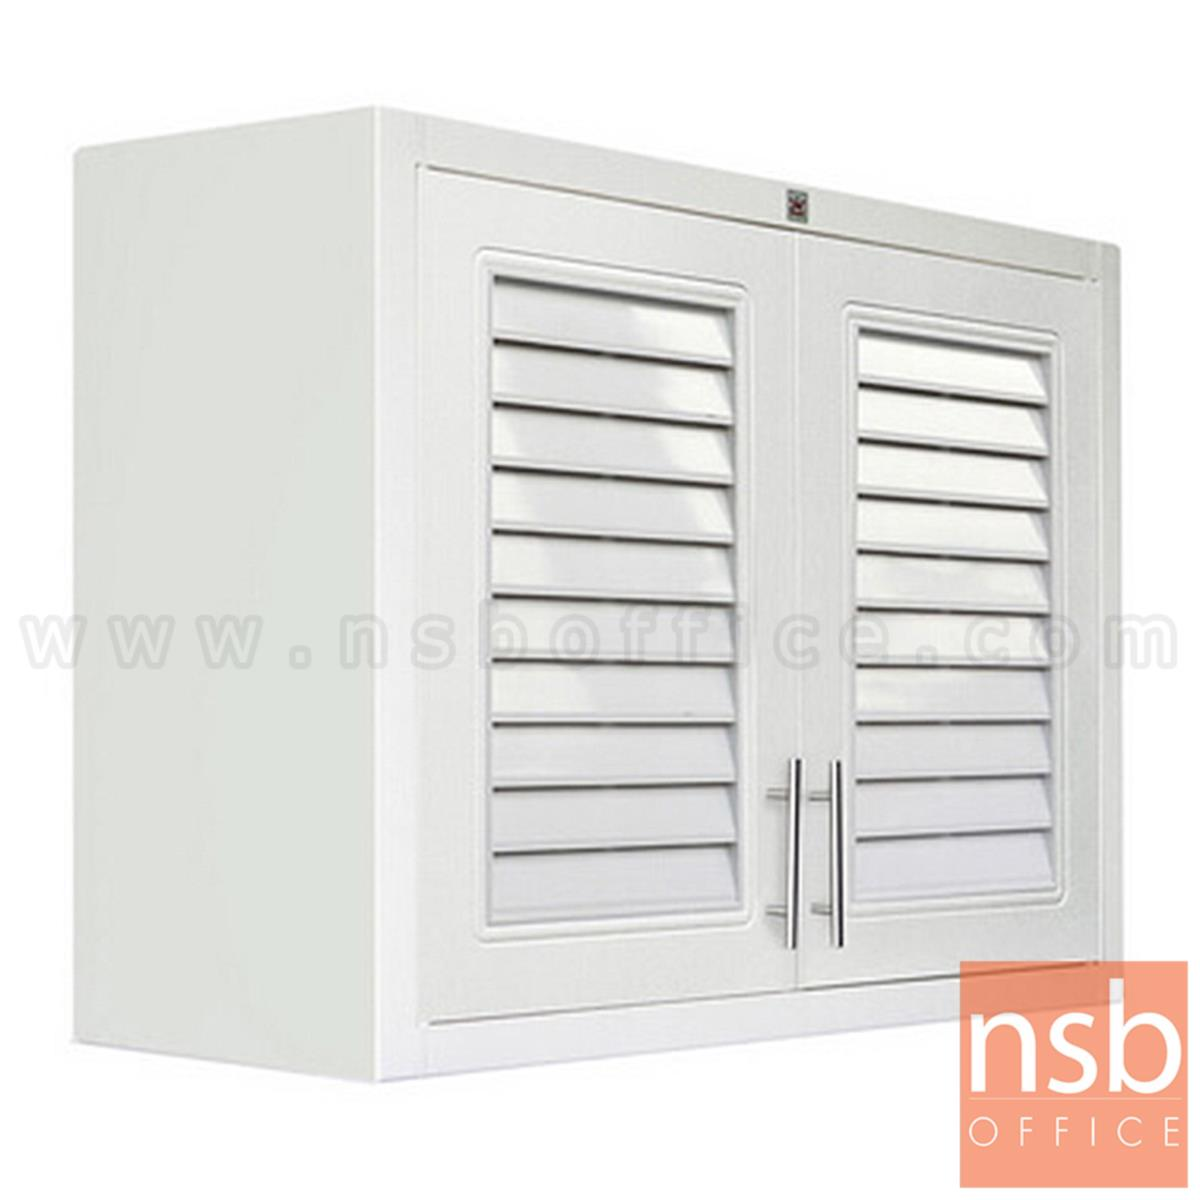 K07A010:ตู้แขวนลอย PVC รุ่น Brown Sugar (บราวชูการ์)  หน้าบานเกร็ต